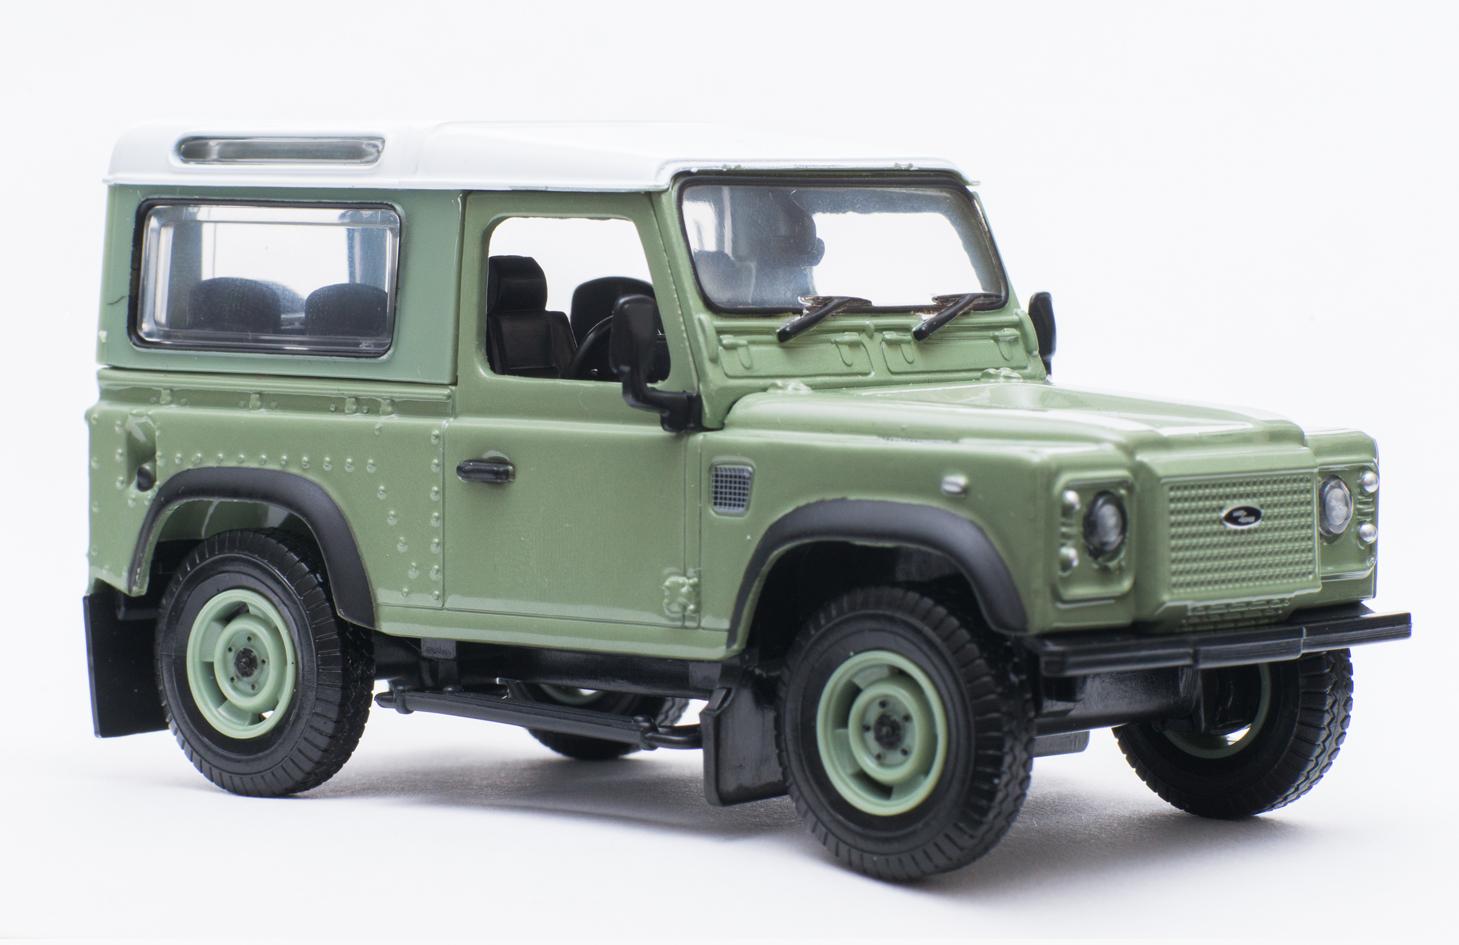 Britains 43110a1 Land Rover Defender Heritage Ltd Edition